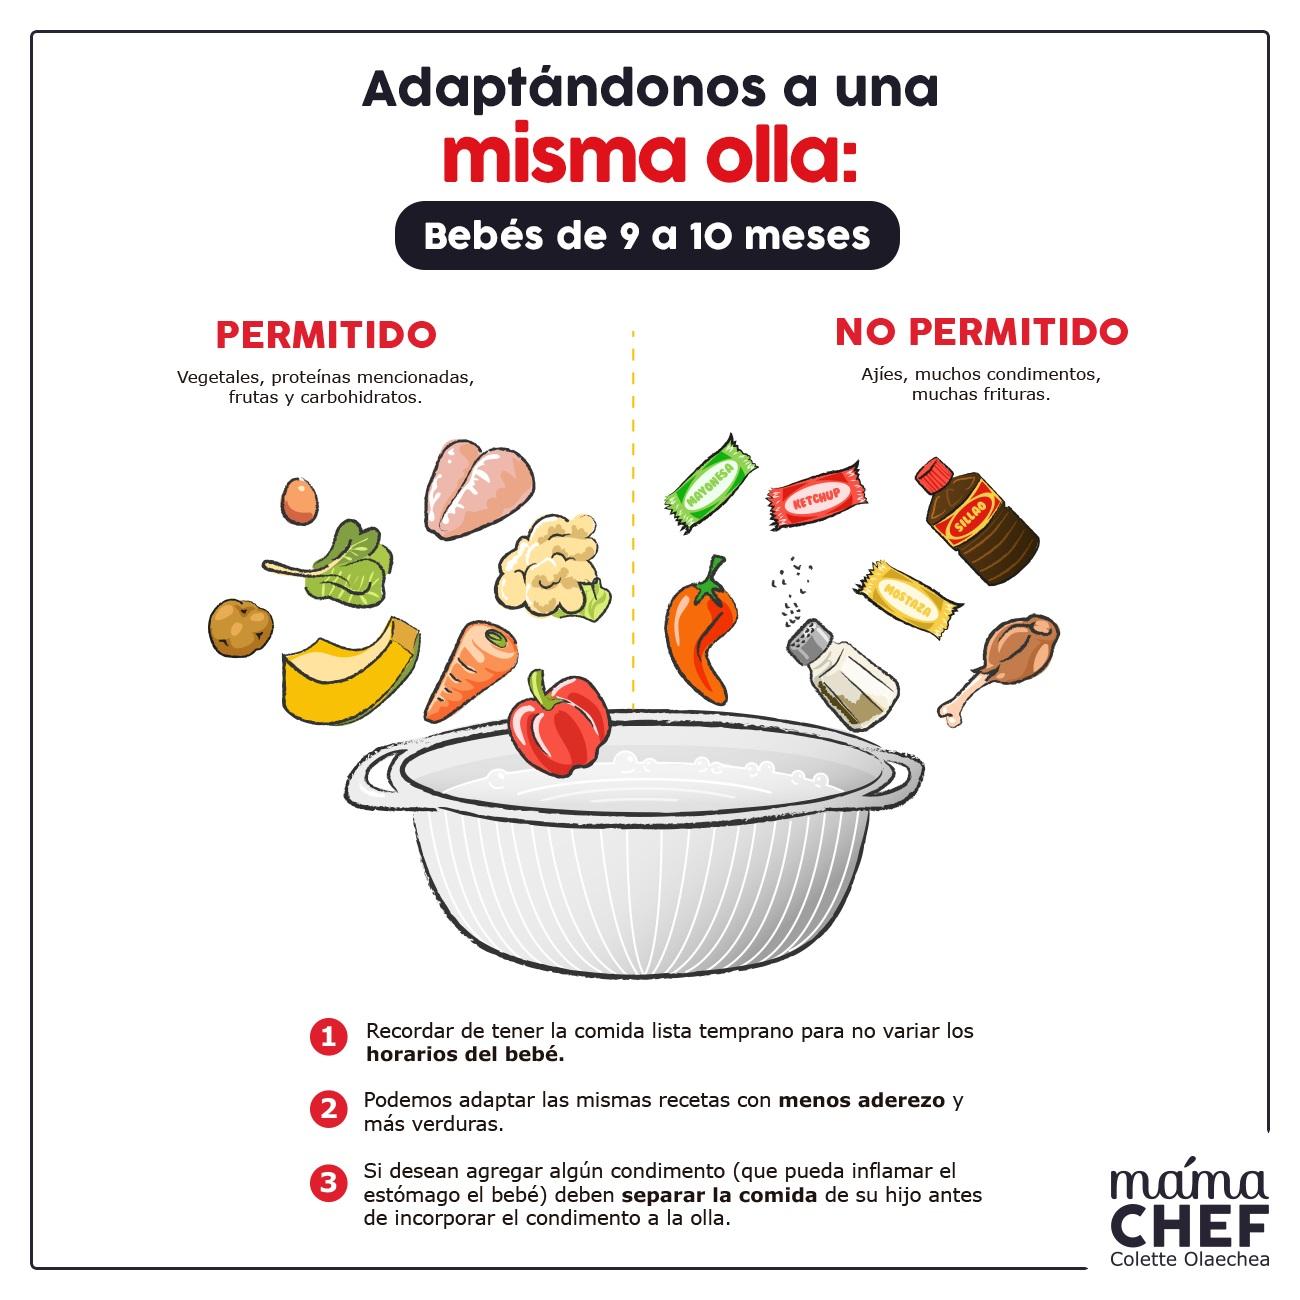 Alimentos permitidos y complementos 9 meses Mama Chef Colette Olaechea Info papillas